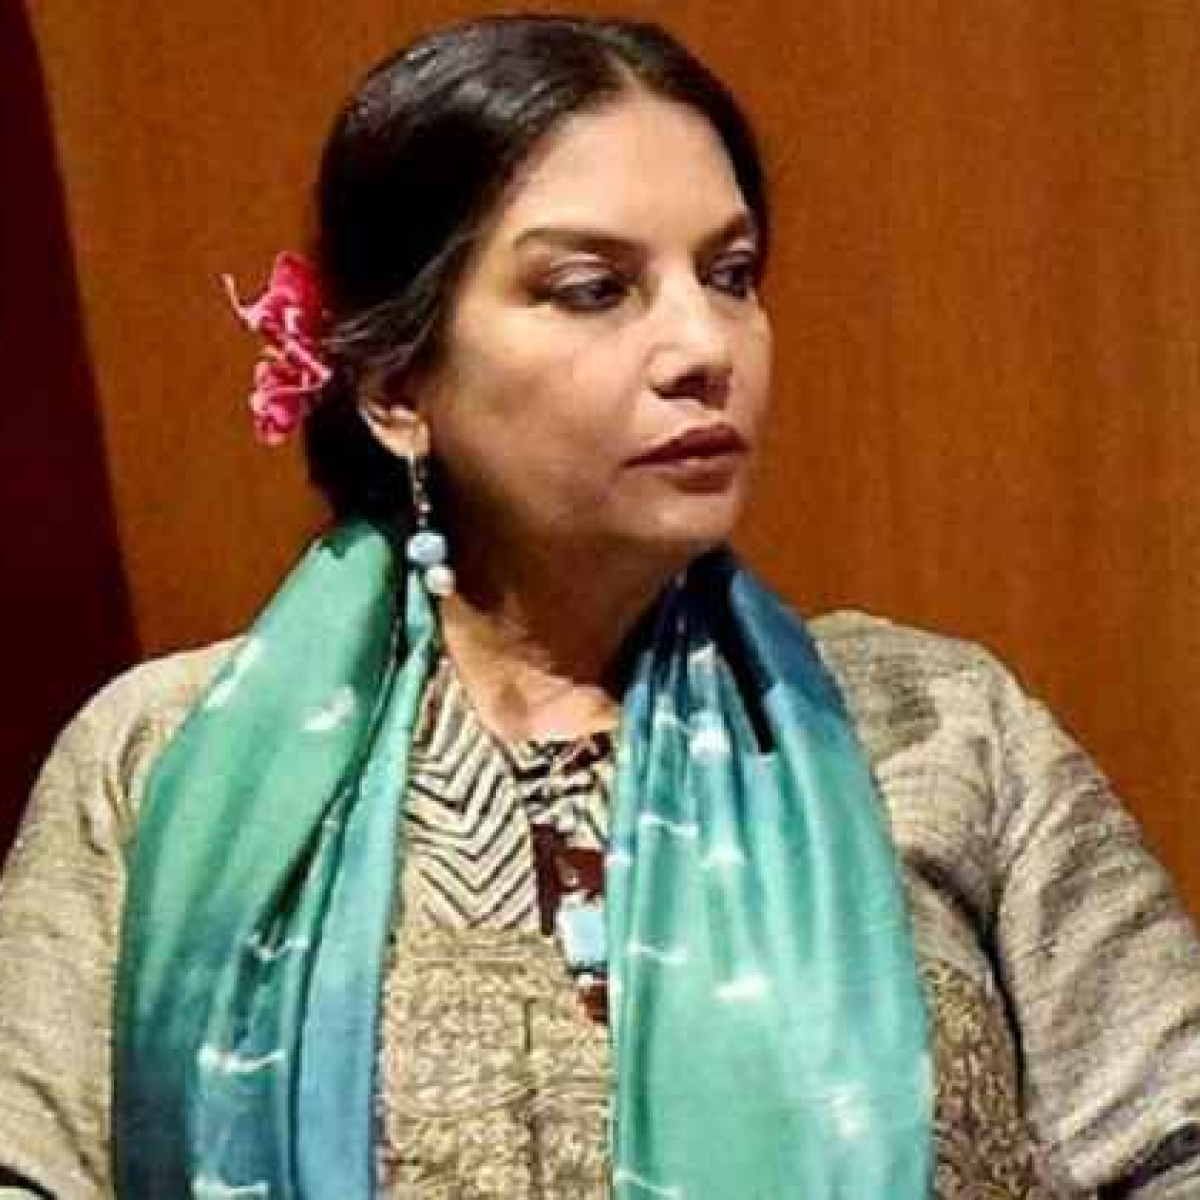 Shabana Azmi condemns attacks on doctors combating coronavirus